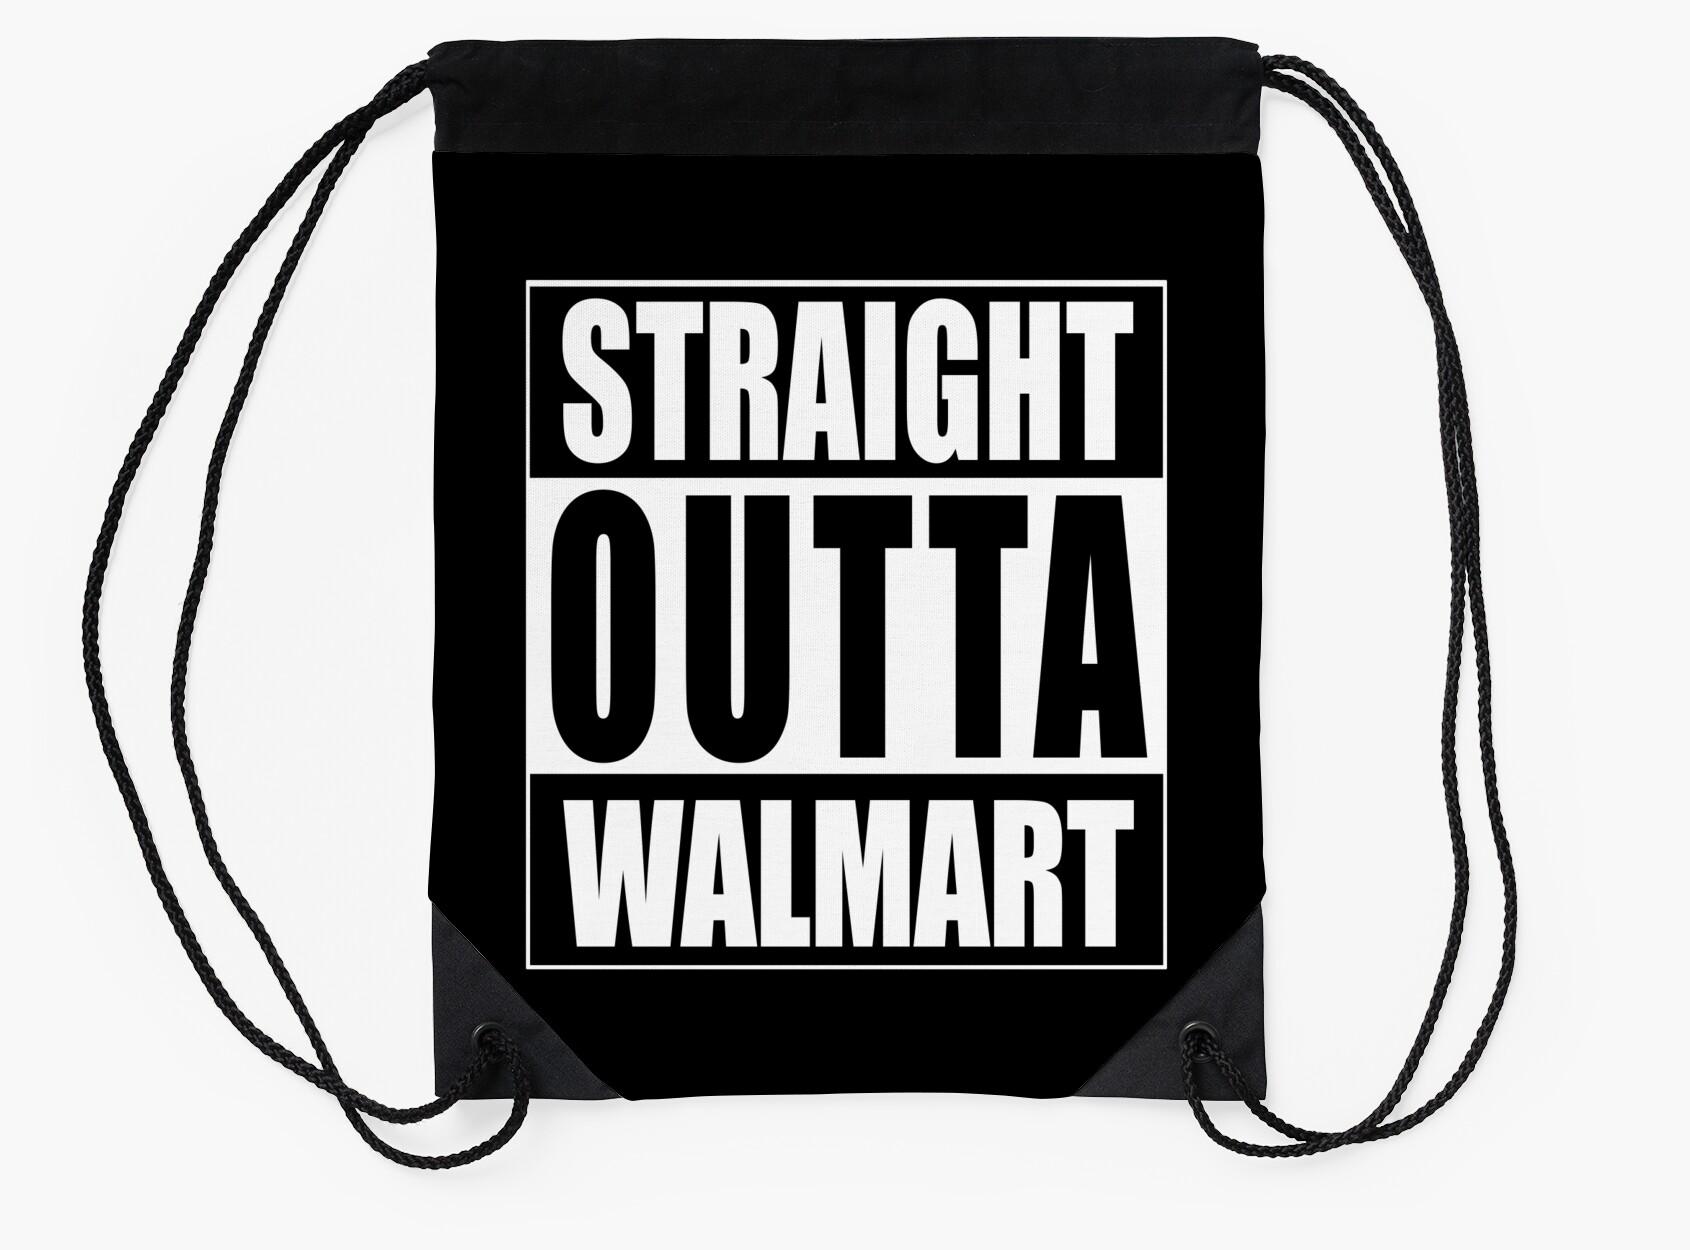 Straight Outta Walmart